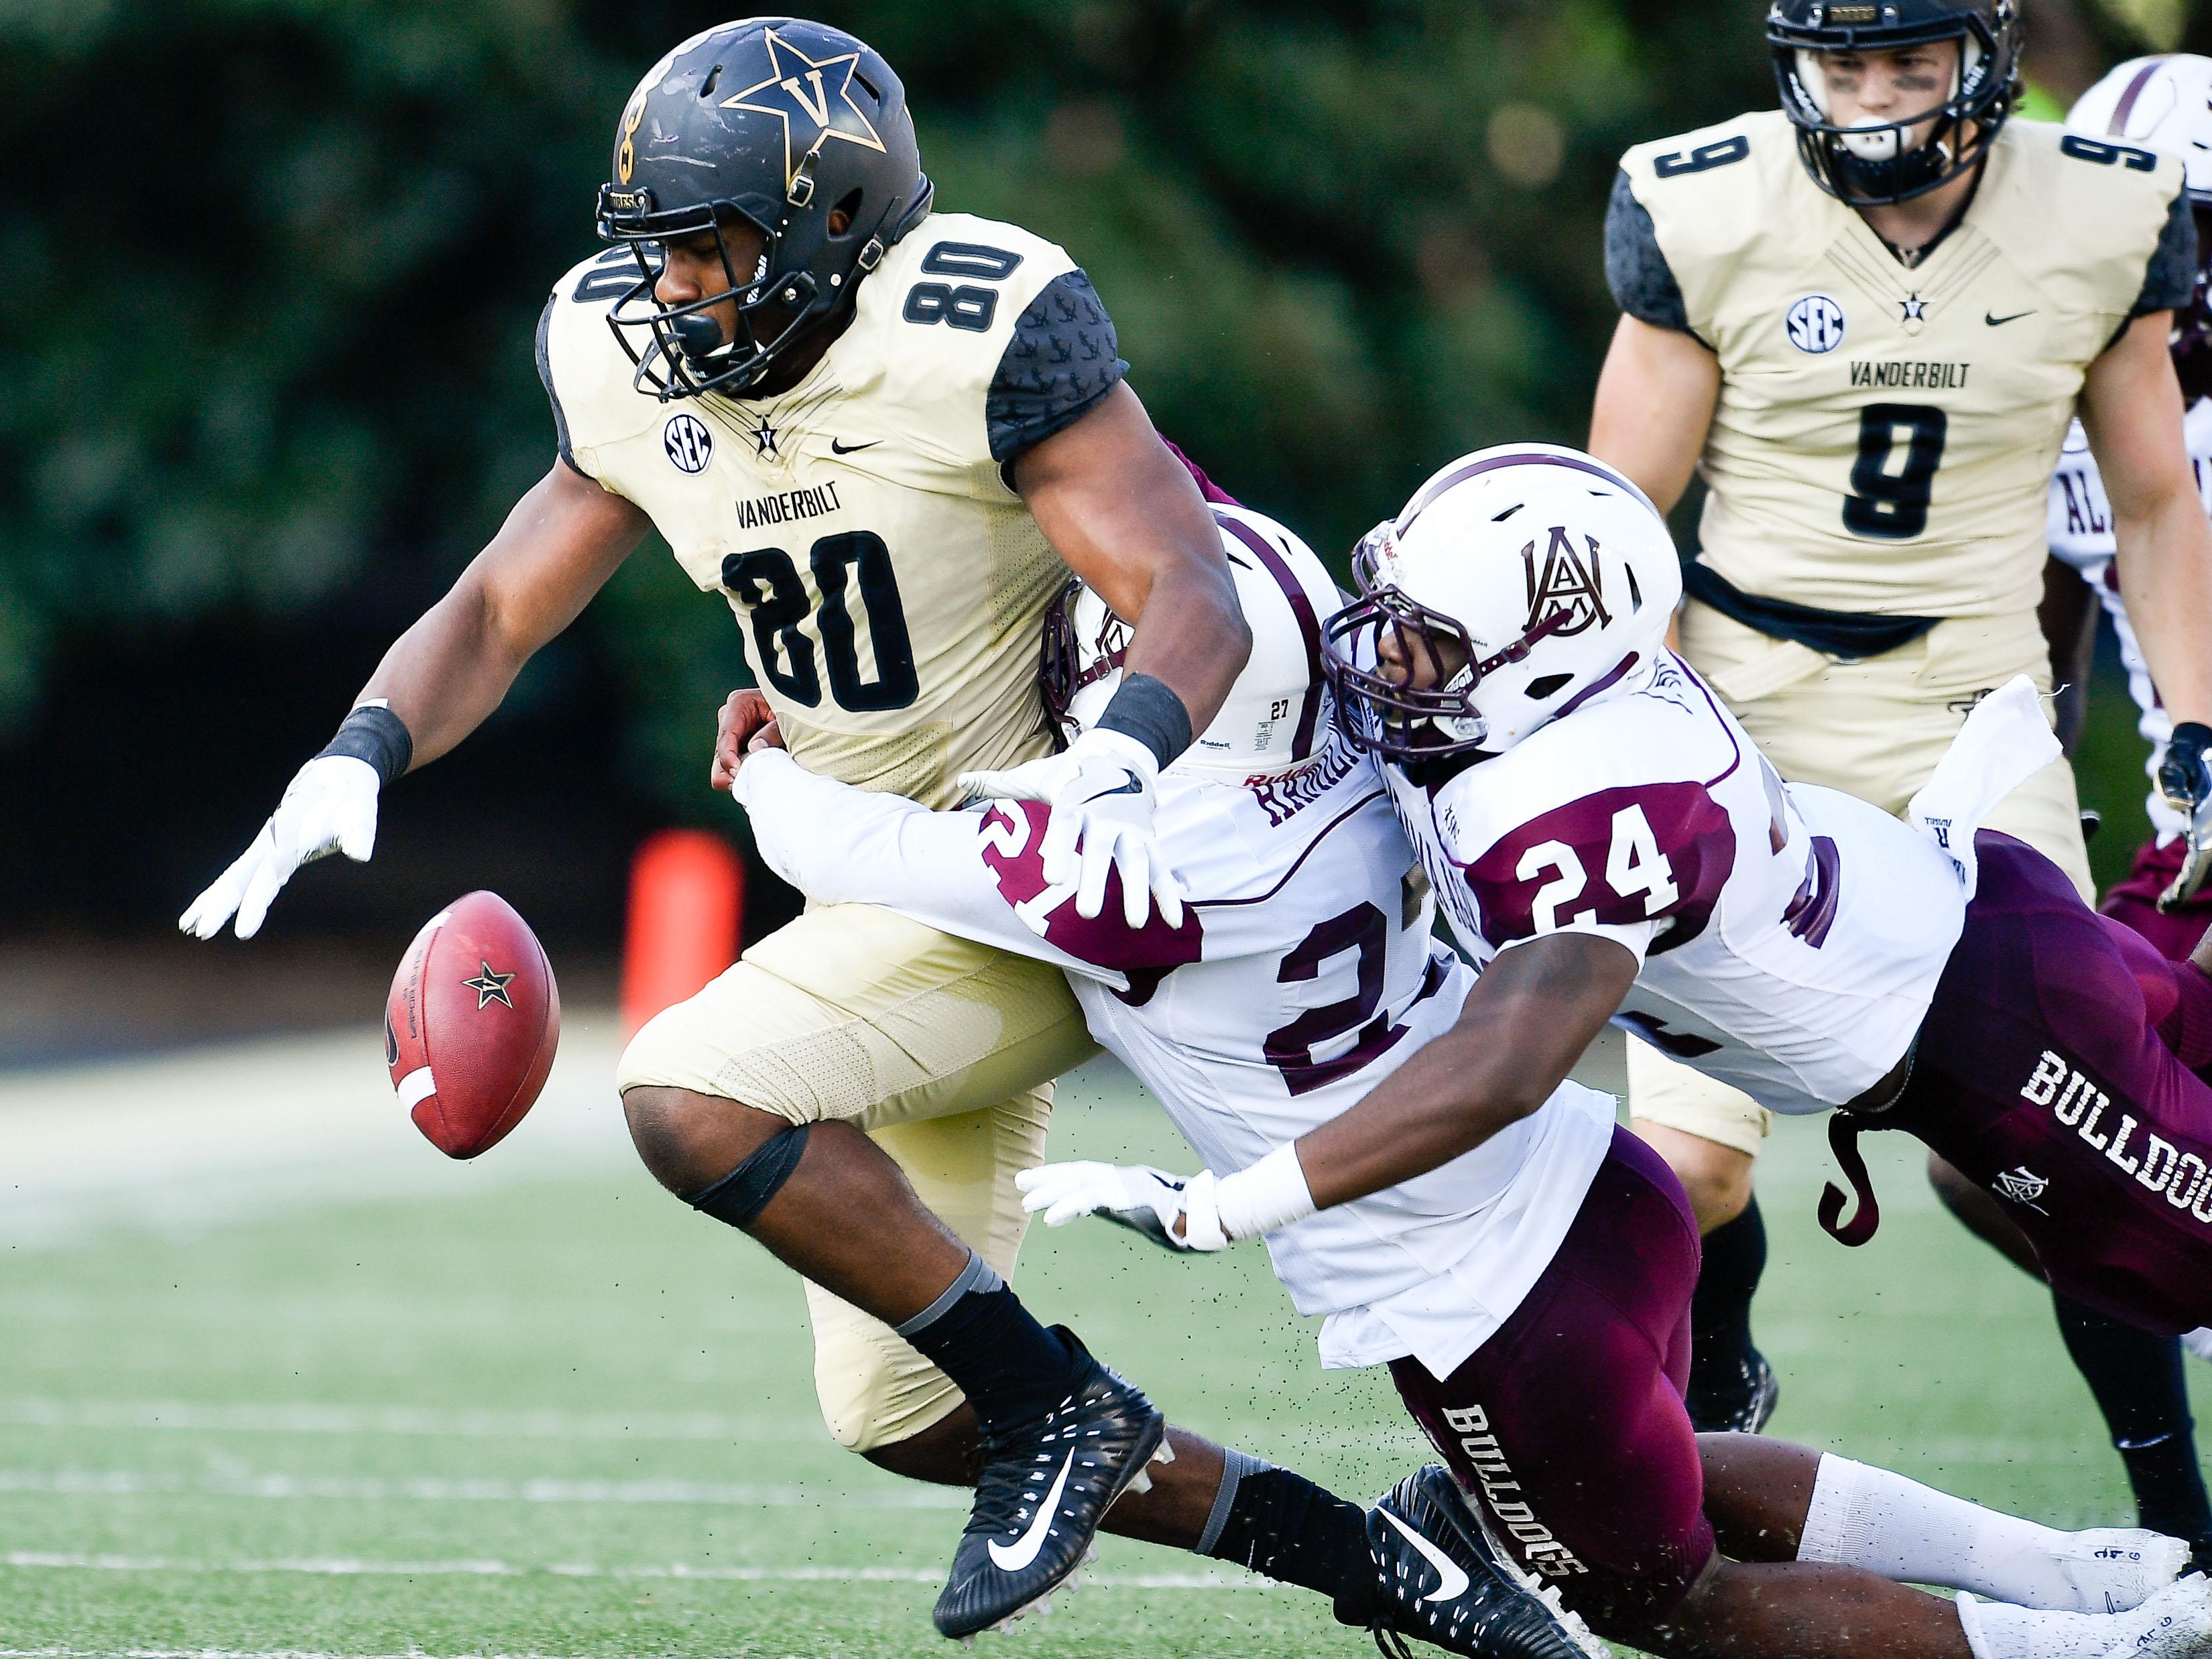 NCAA Football: Alabama A&M at Vanderbilt